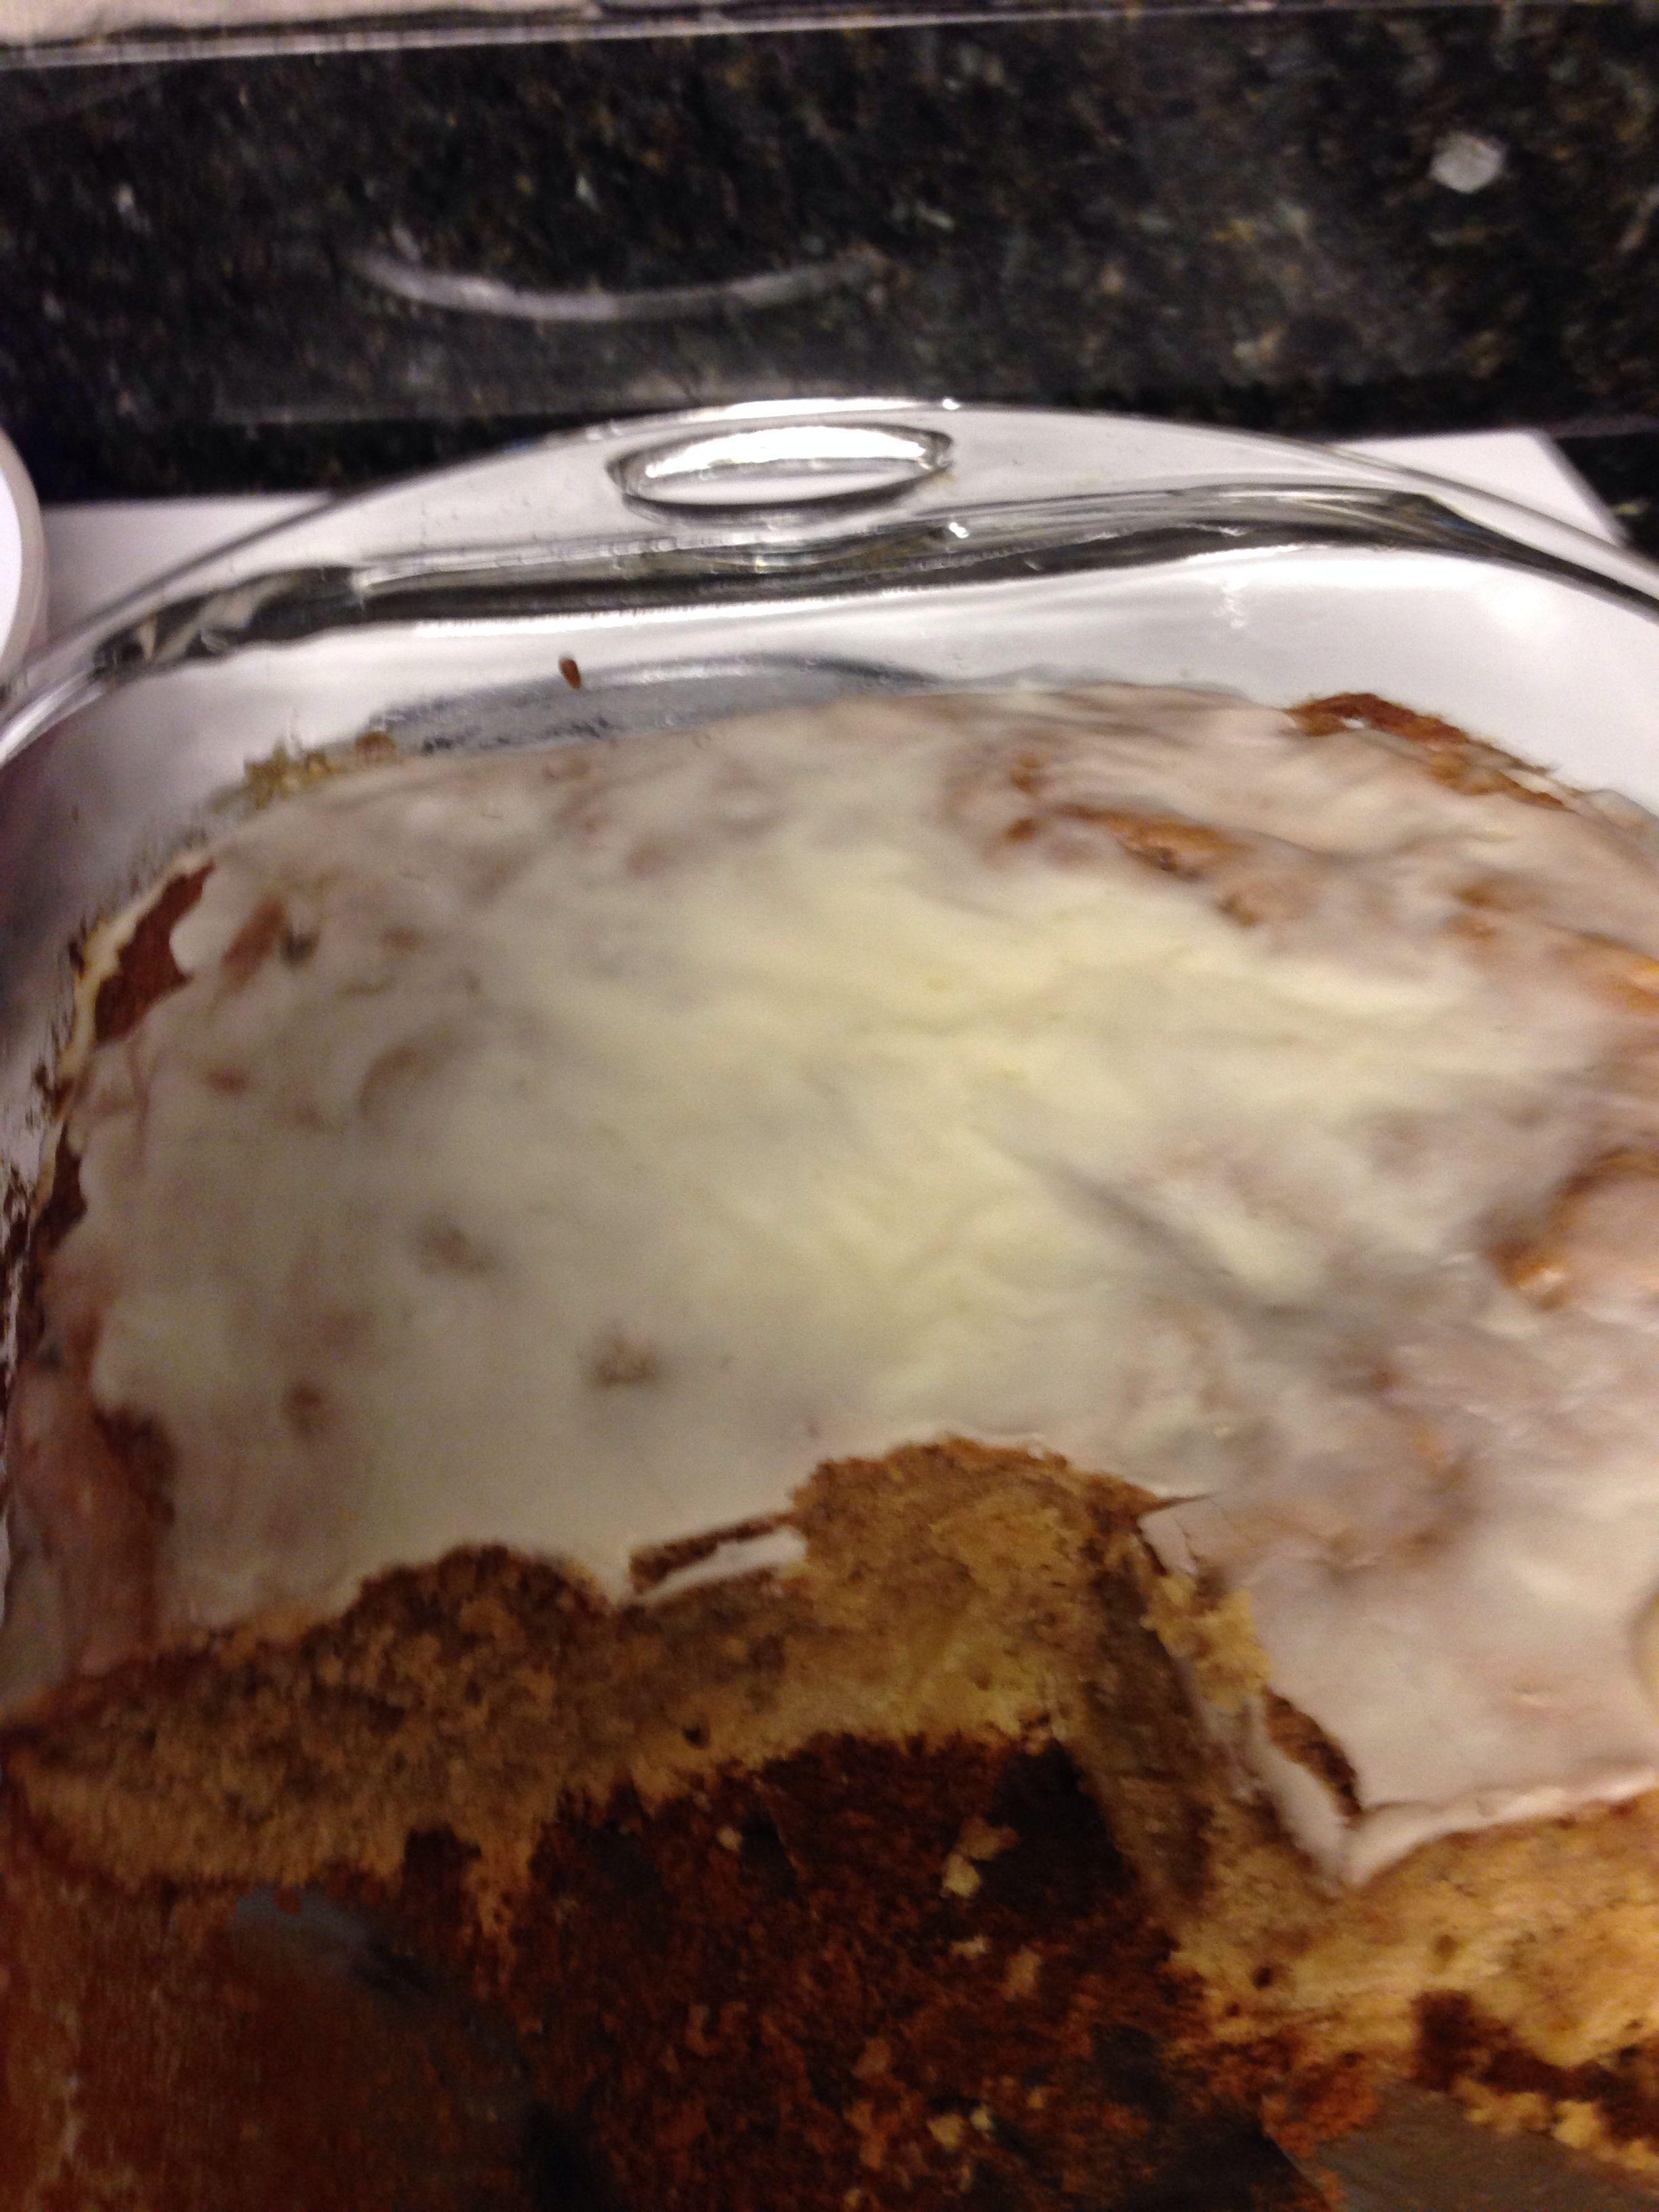 Homemade cinnamon roll cake